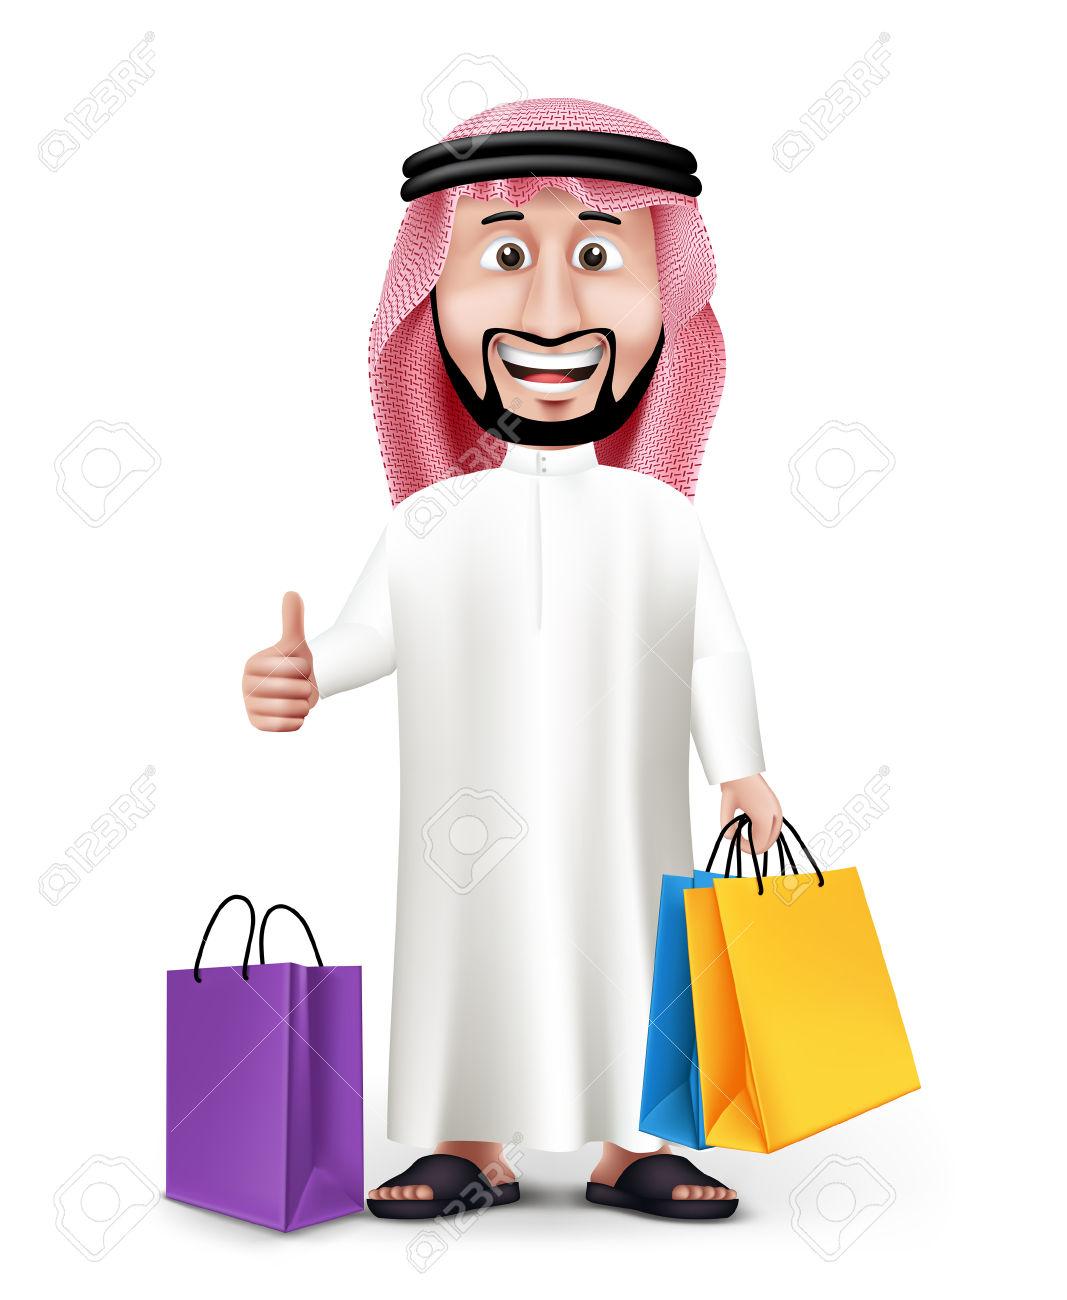 Saudi Clipart.